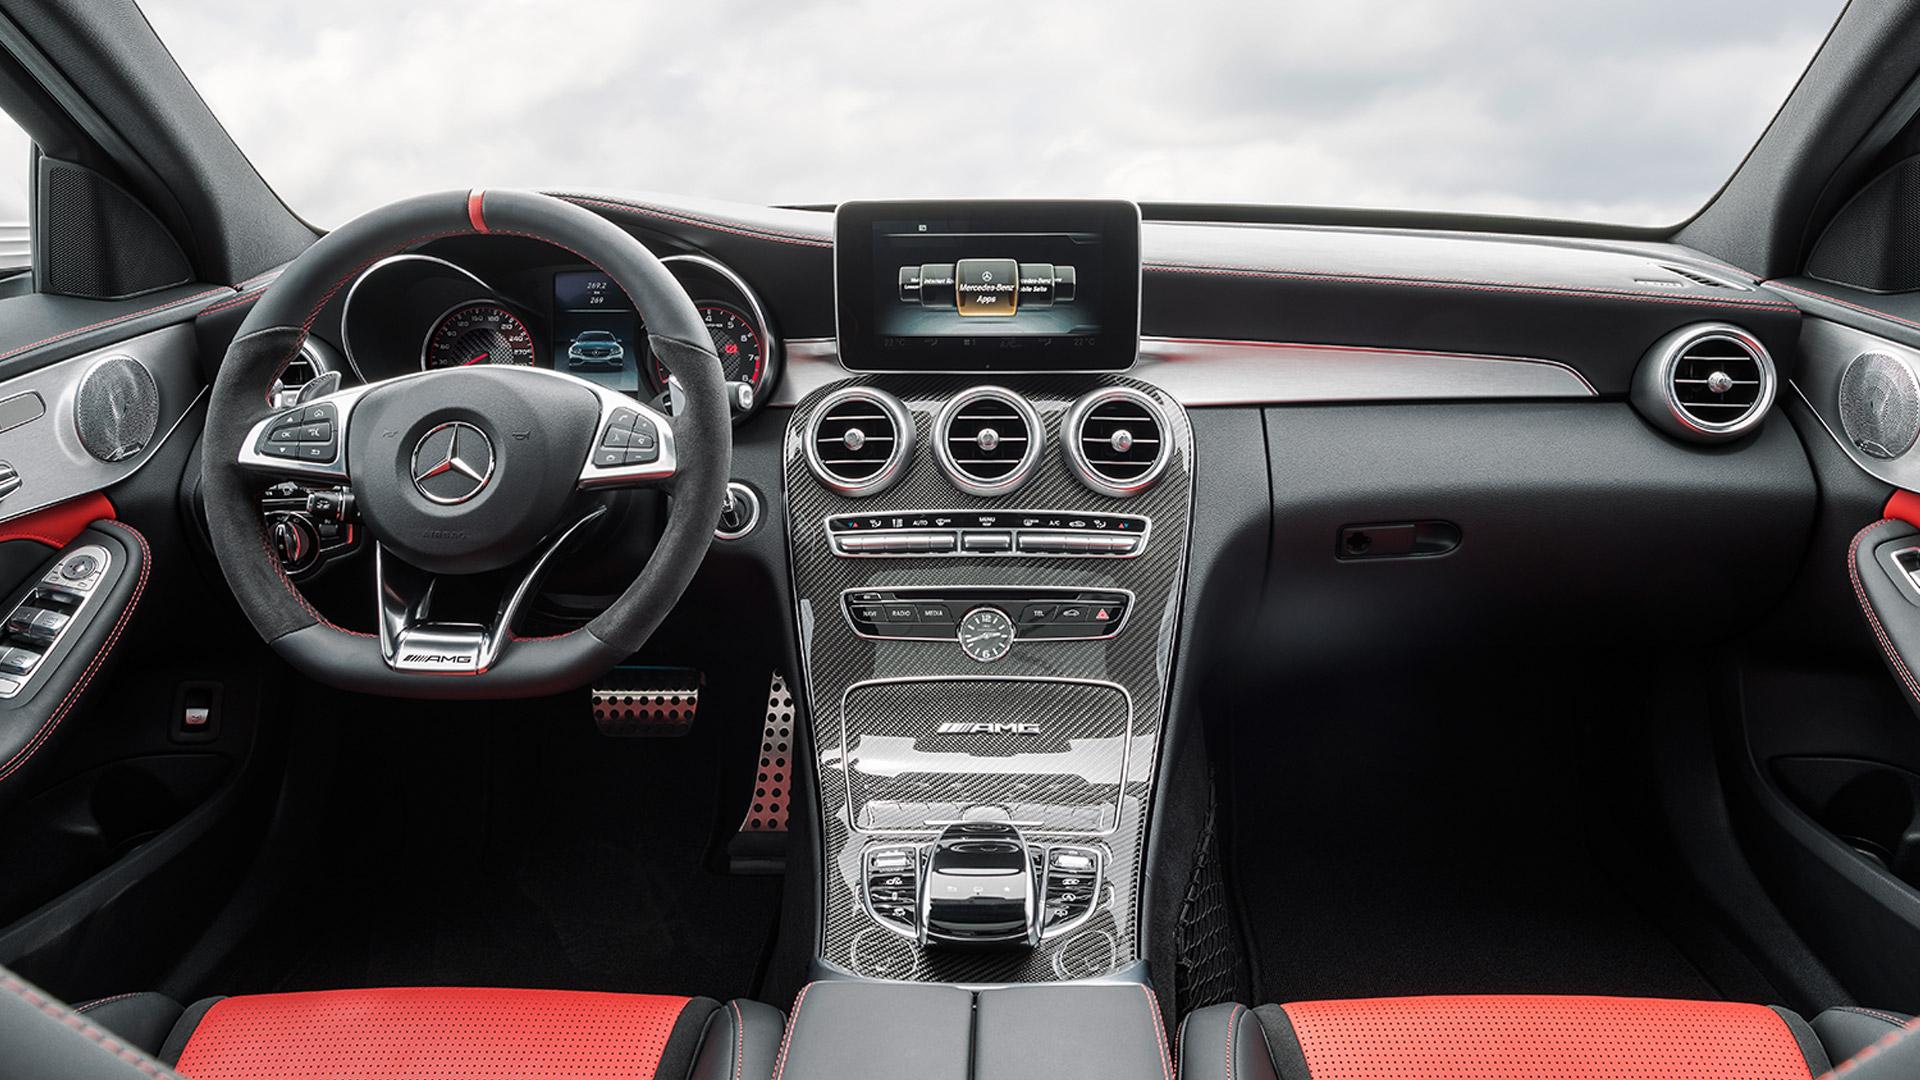 Mercedes Benz C 63 AMG 2015 S Compare